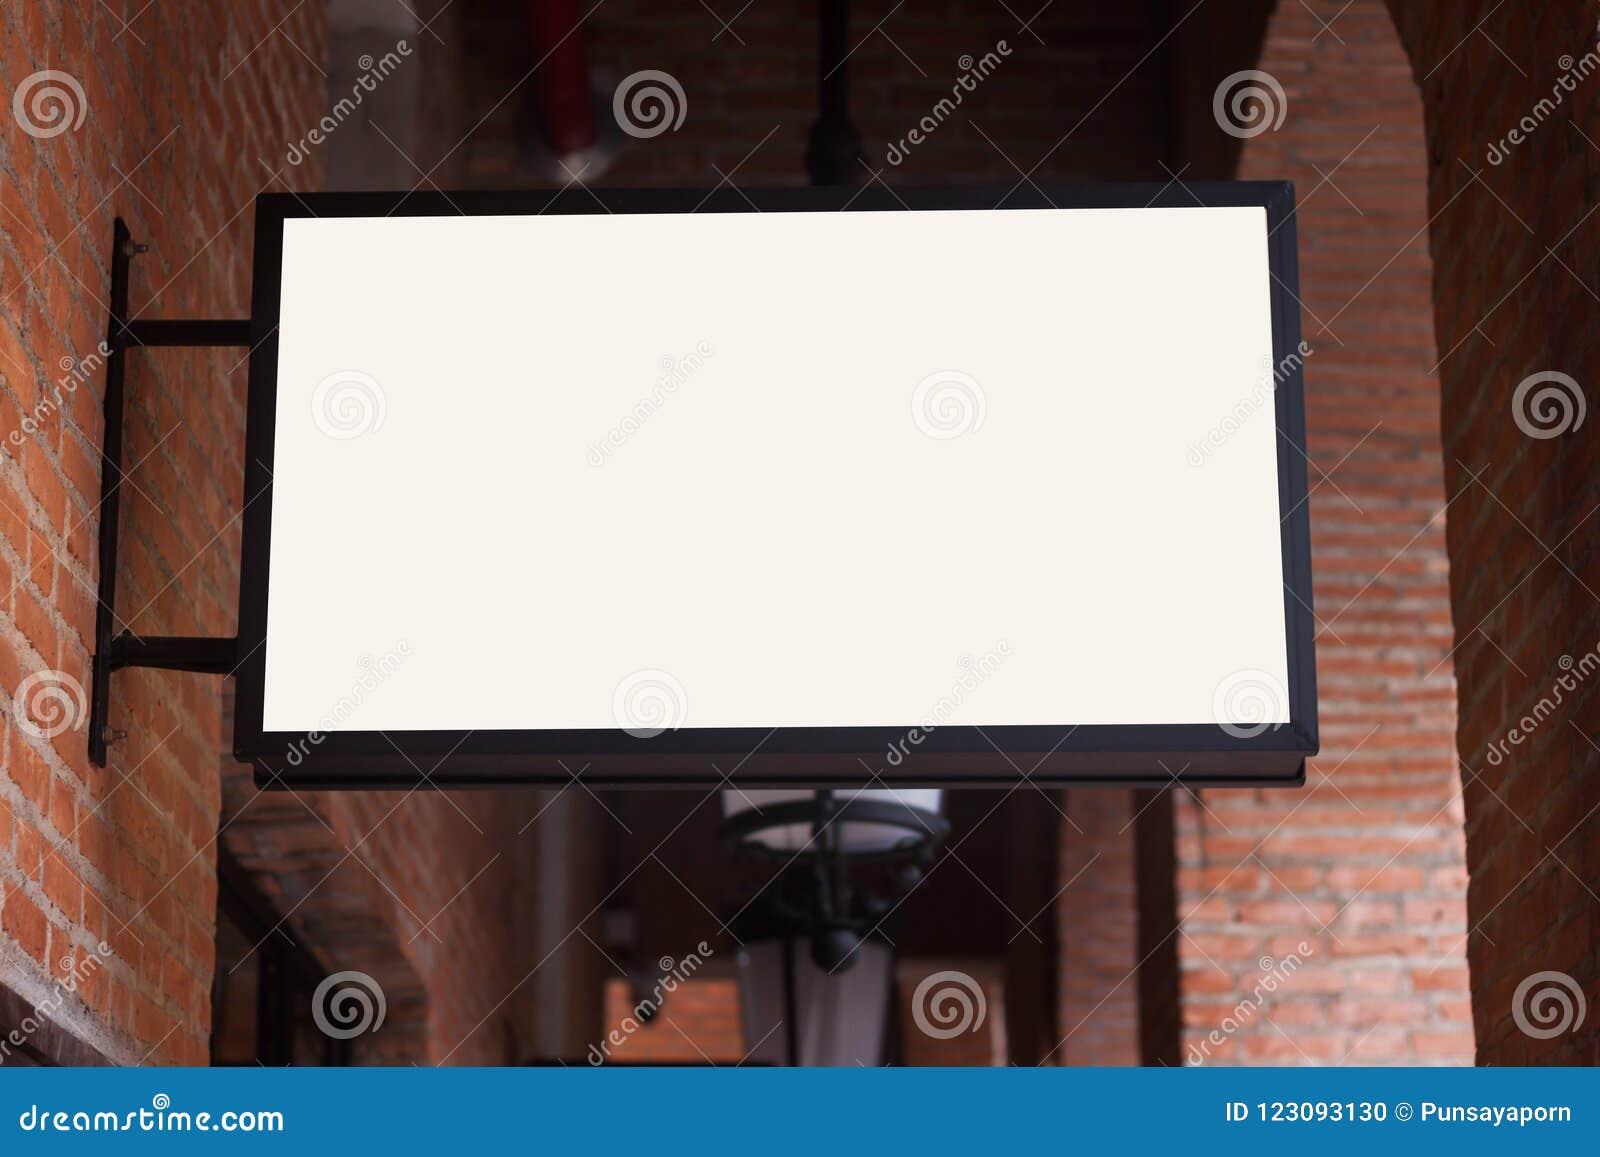 Letrero blanco del regtangle en la pared de ladrillo